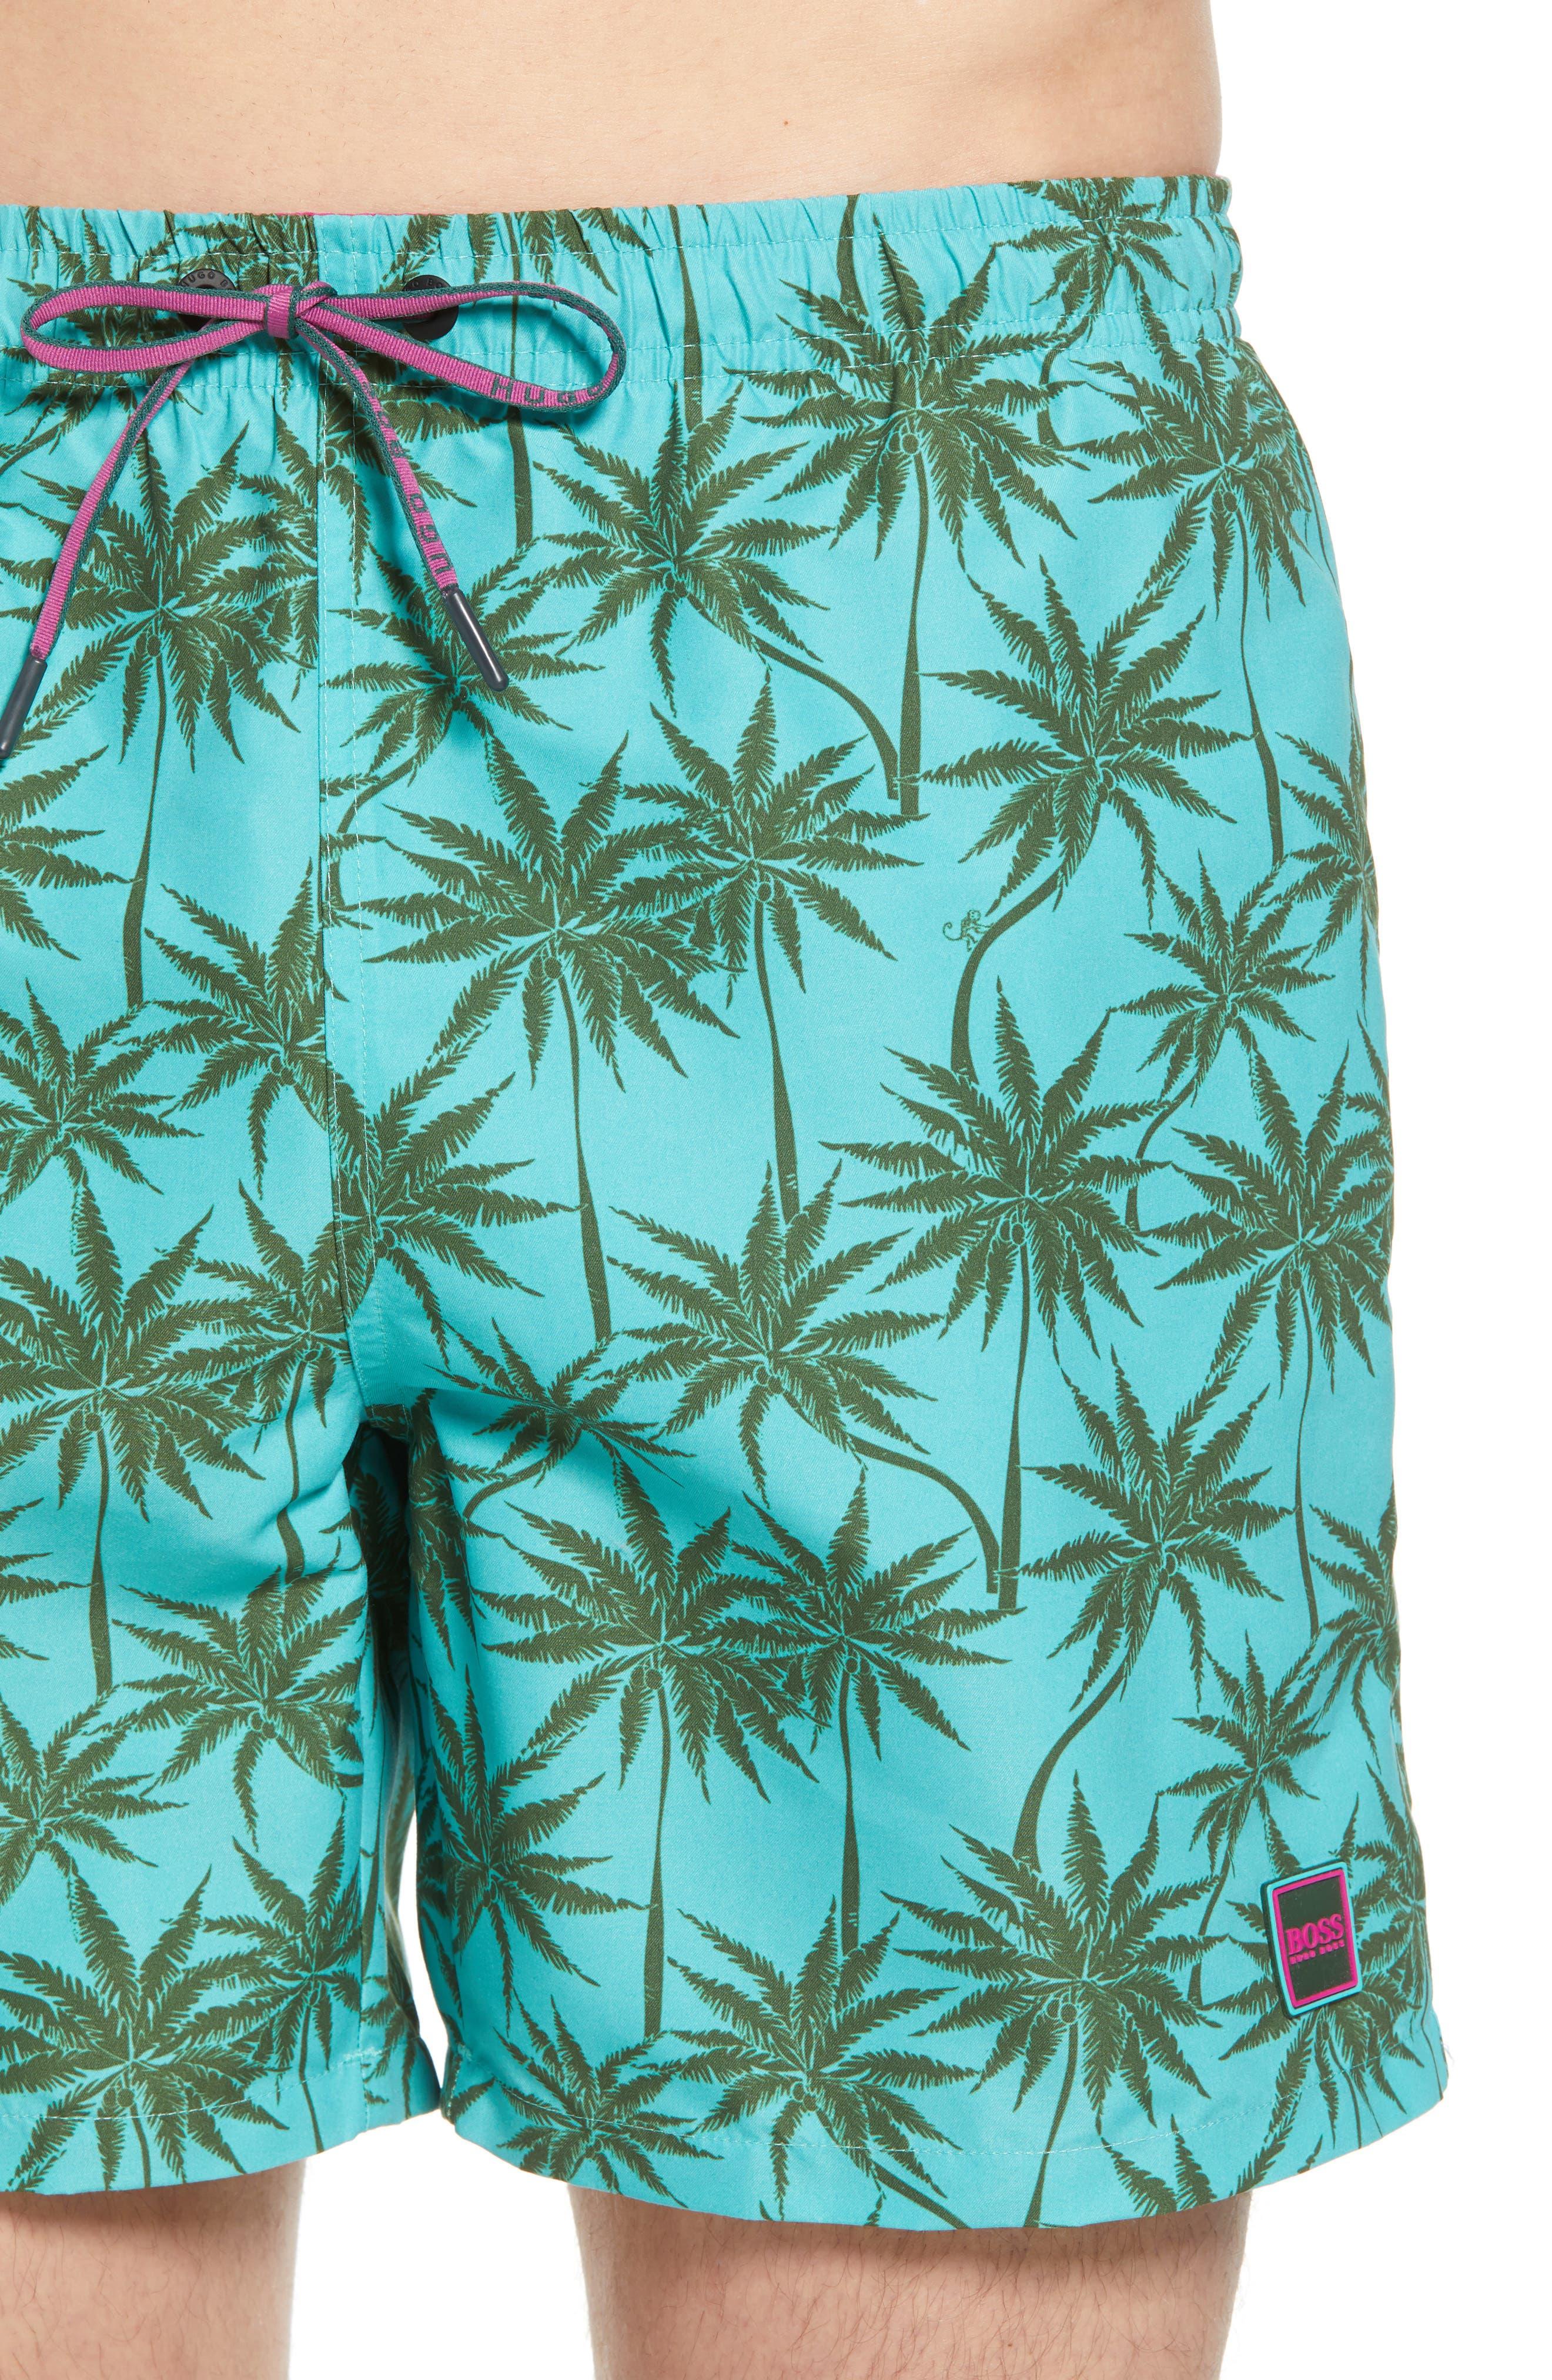 Piranha Palm Tree Swim Trunks,                             Alternate thumbnail 4, color,                             483